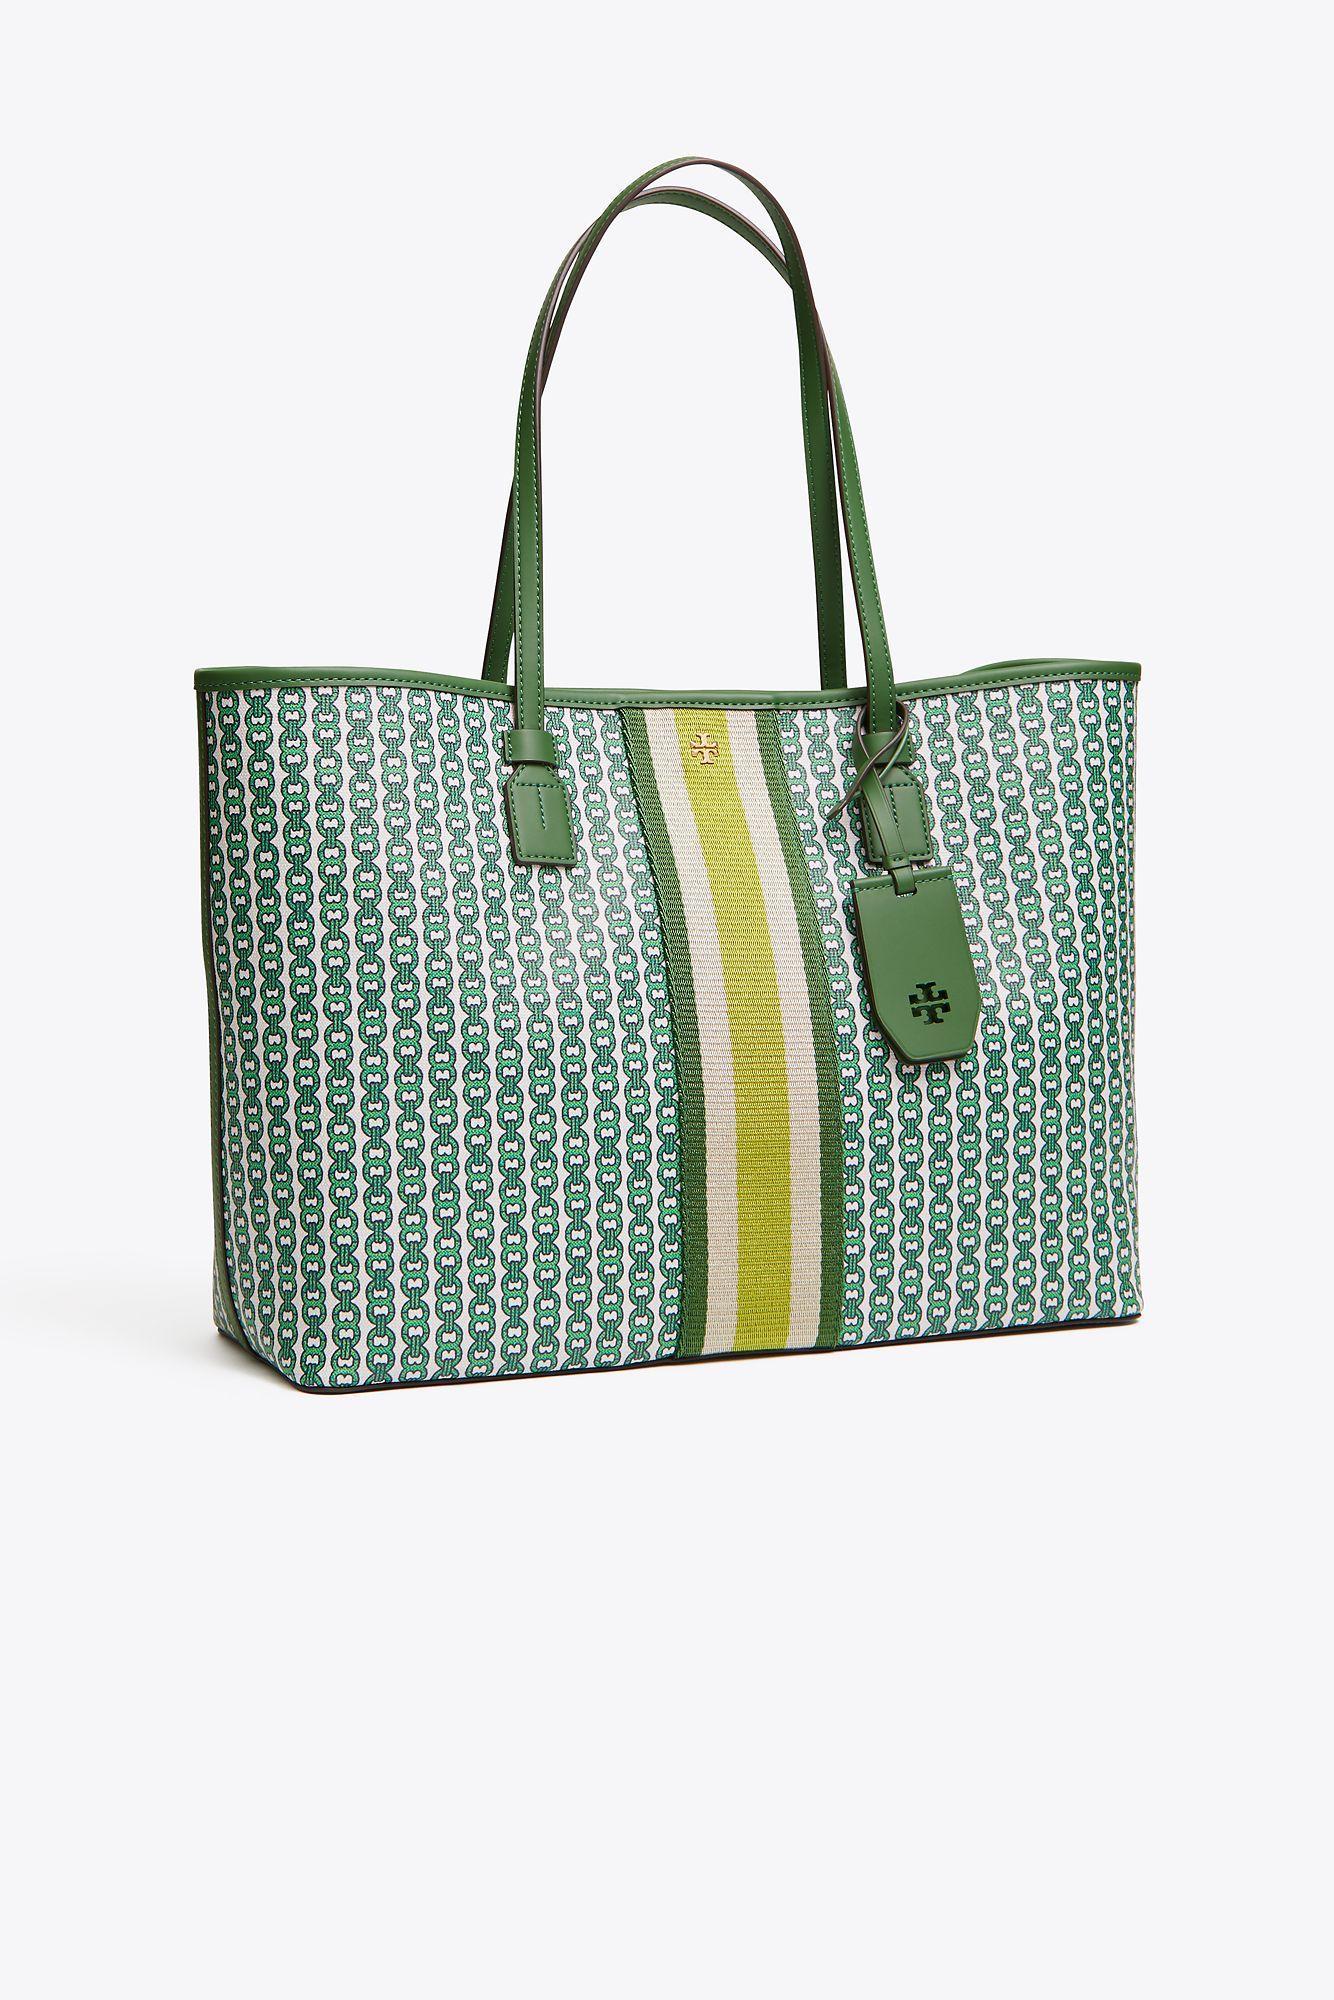 2c885eef1aec Tory Burch Jemini Tote Bag in Green - Save 18% - Lyst